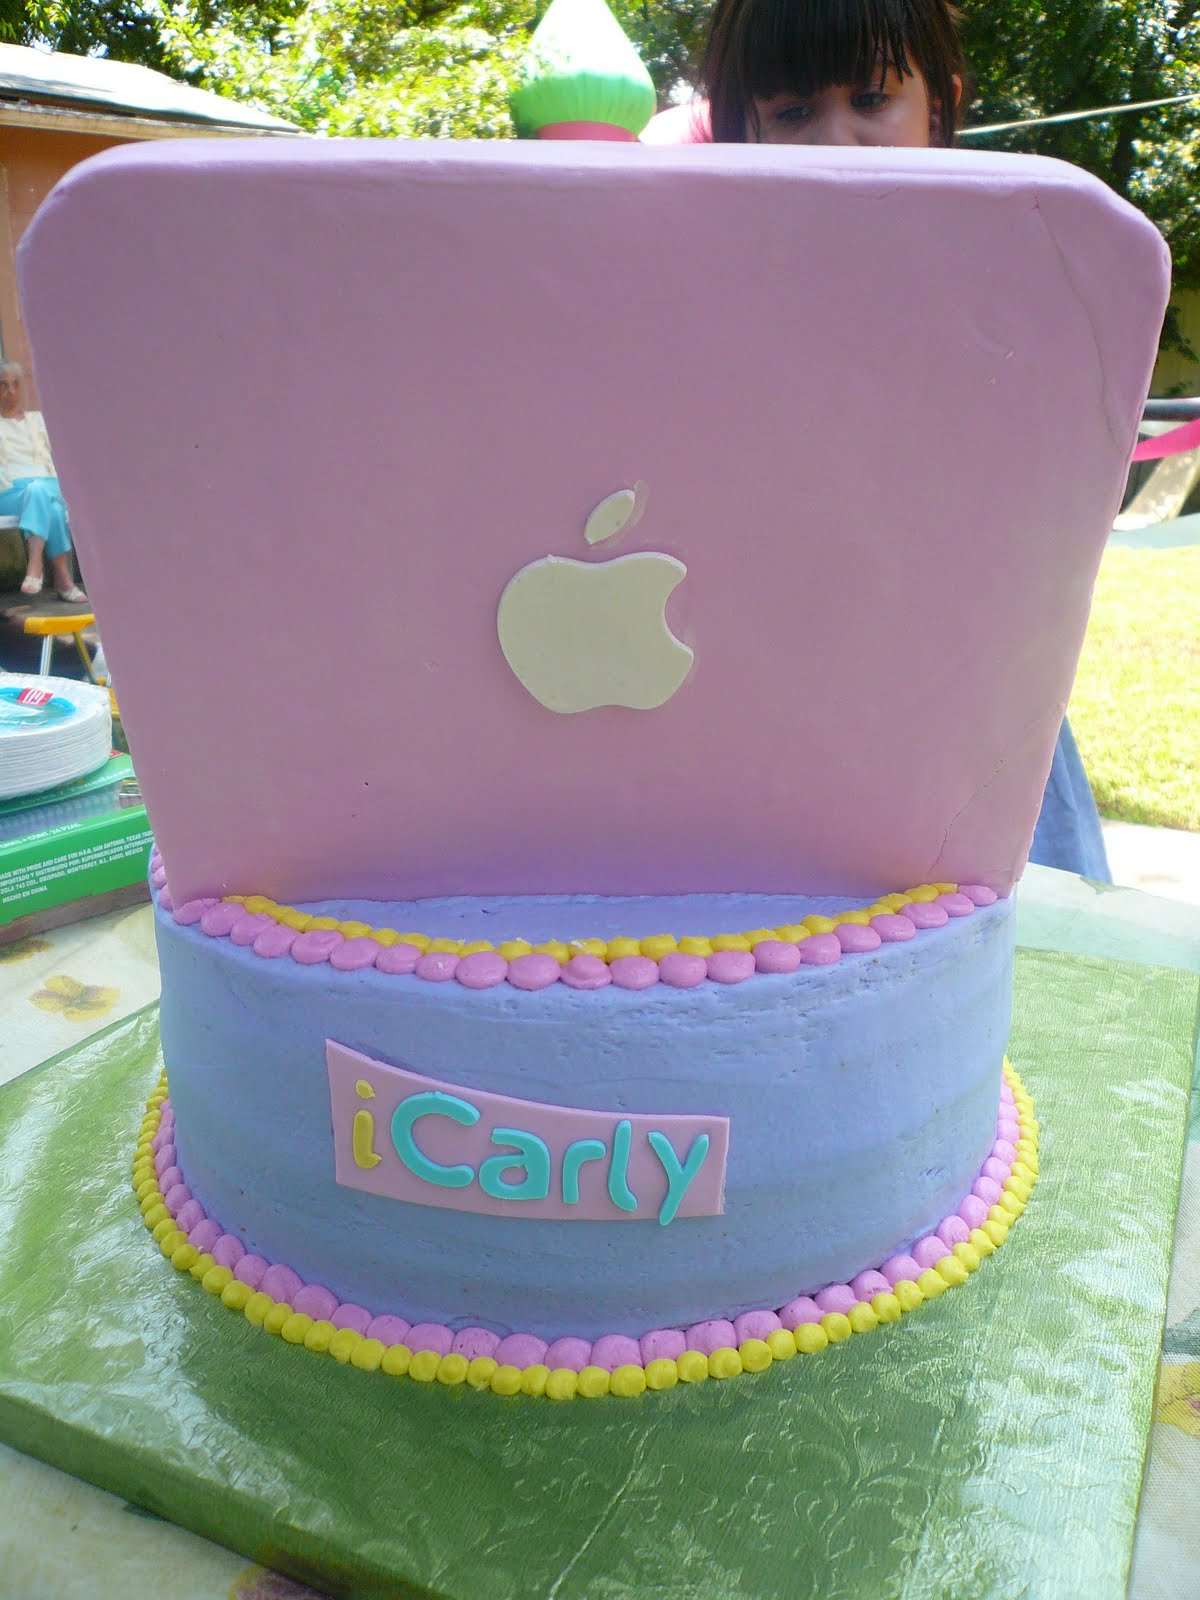 http://1.bp.blogspot.com/_ZBIi5Ka2WB0/TAsRJu3pDCI/AAAAAAAAABk/gJMwJF6KOFI/s1600/icarly+mac+cake.JPG